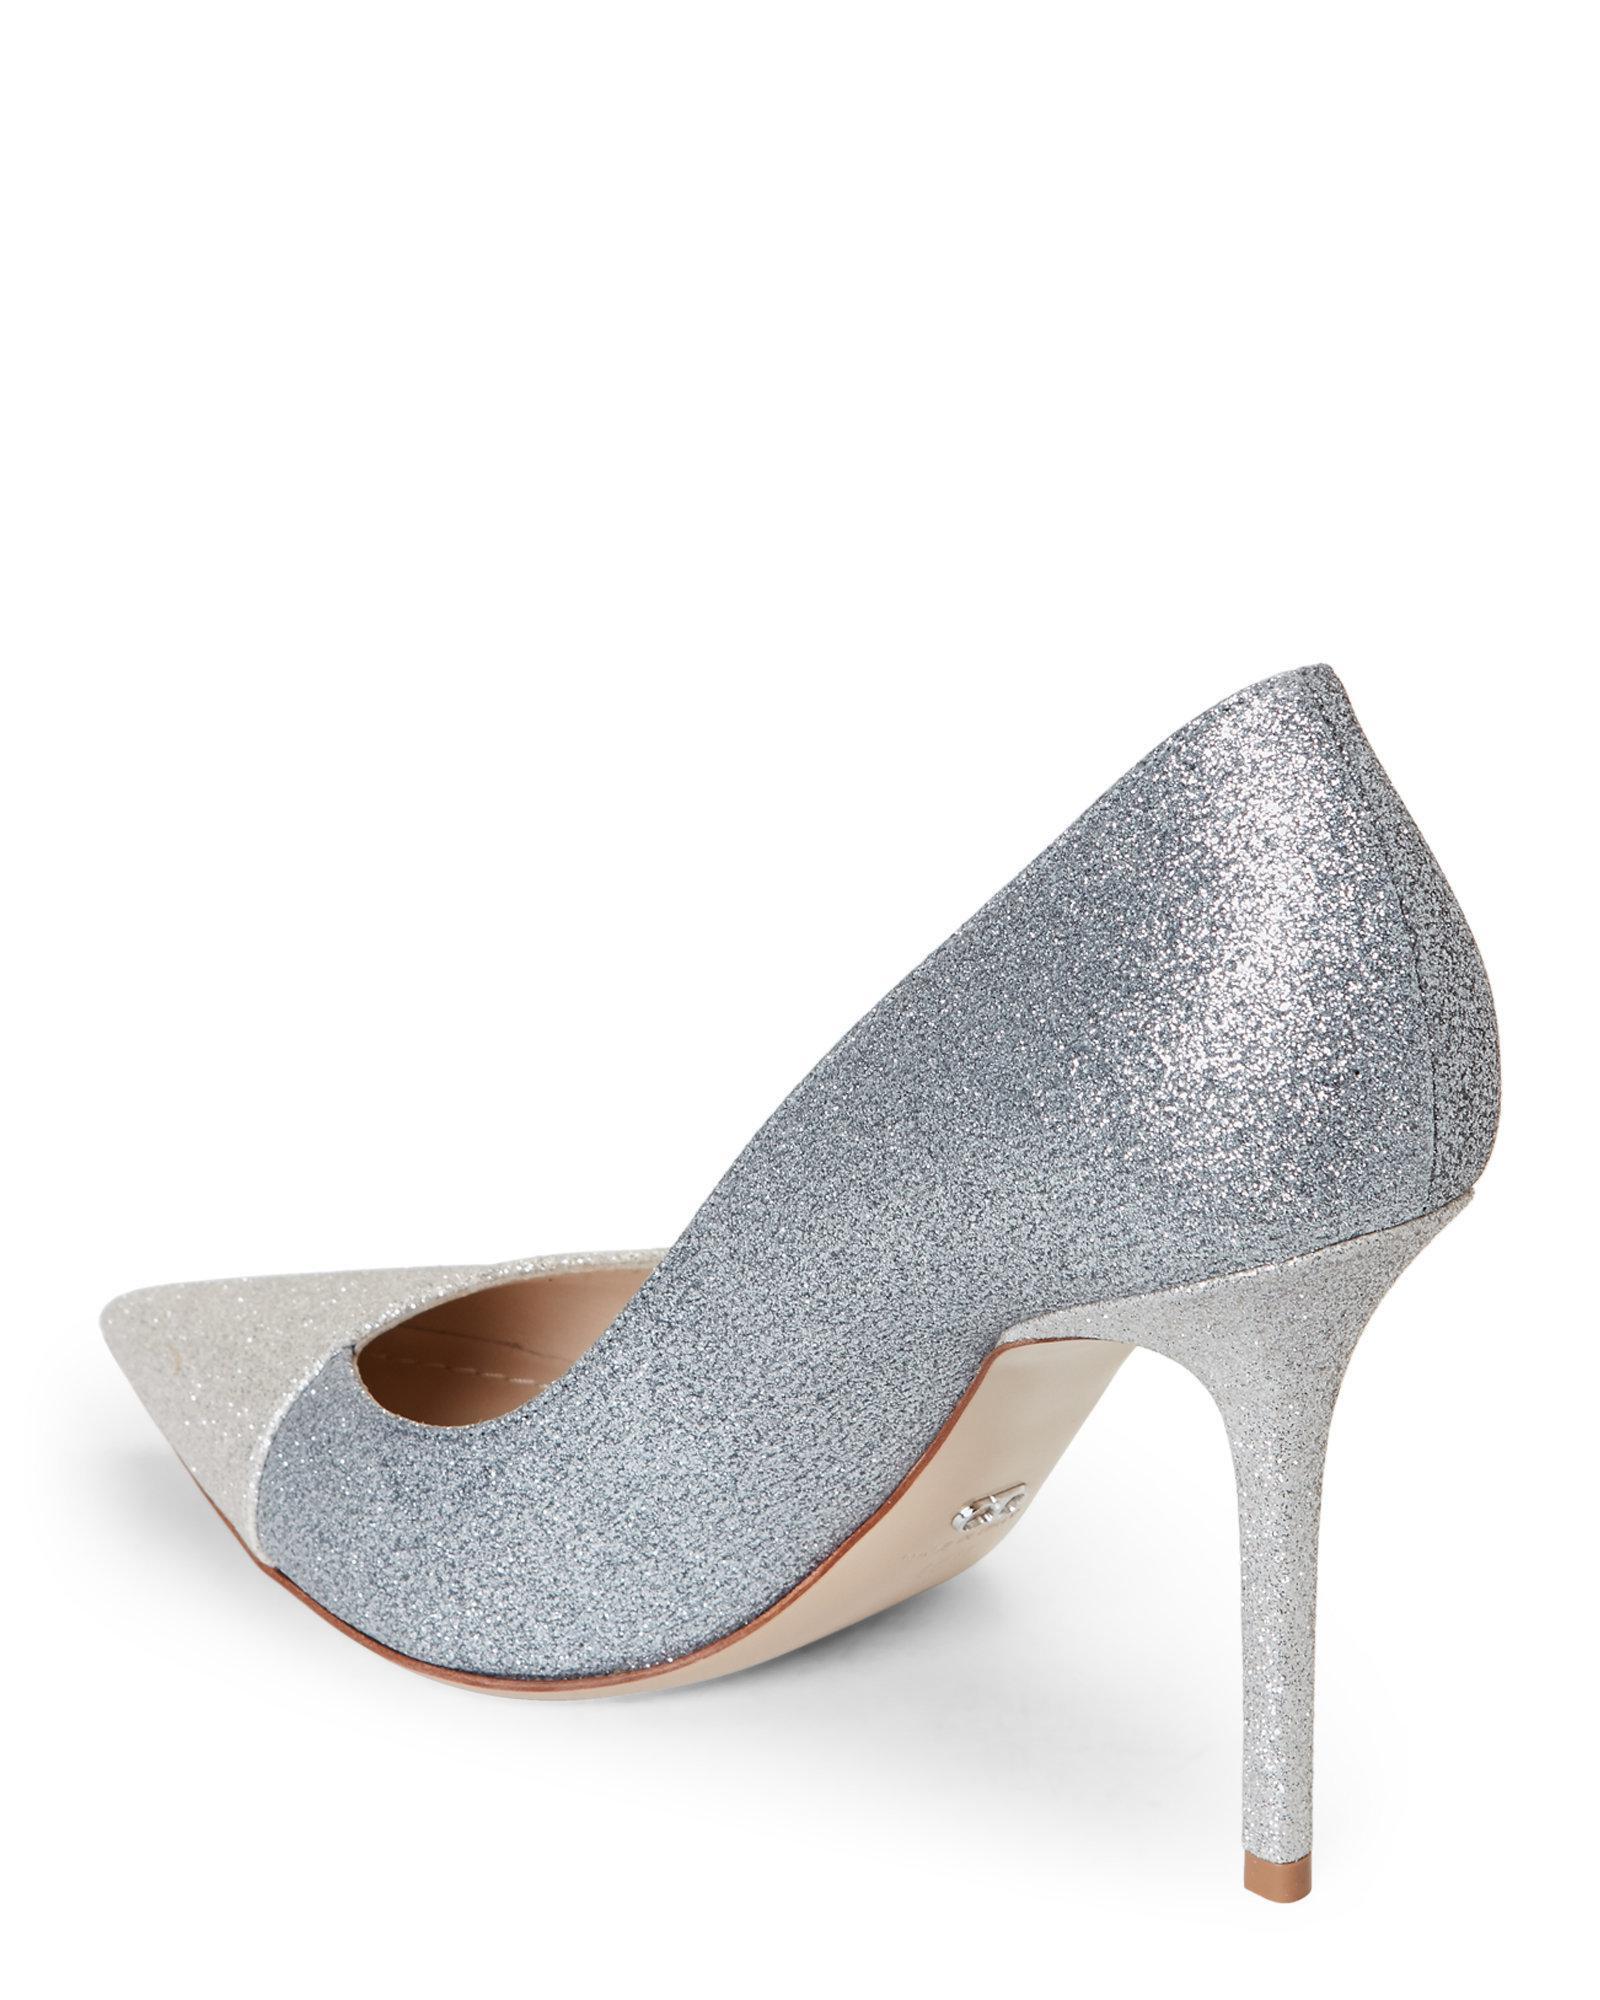 Dior Glitter Heels